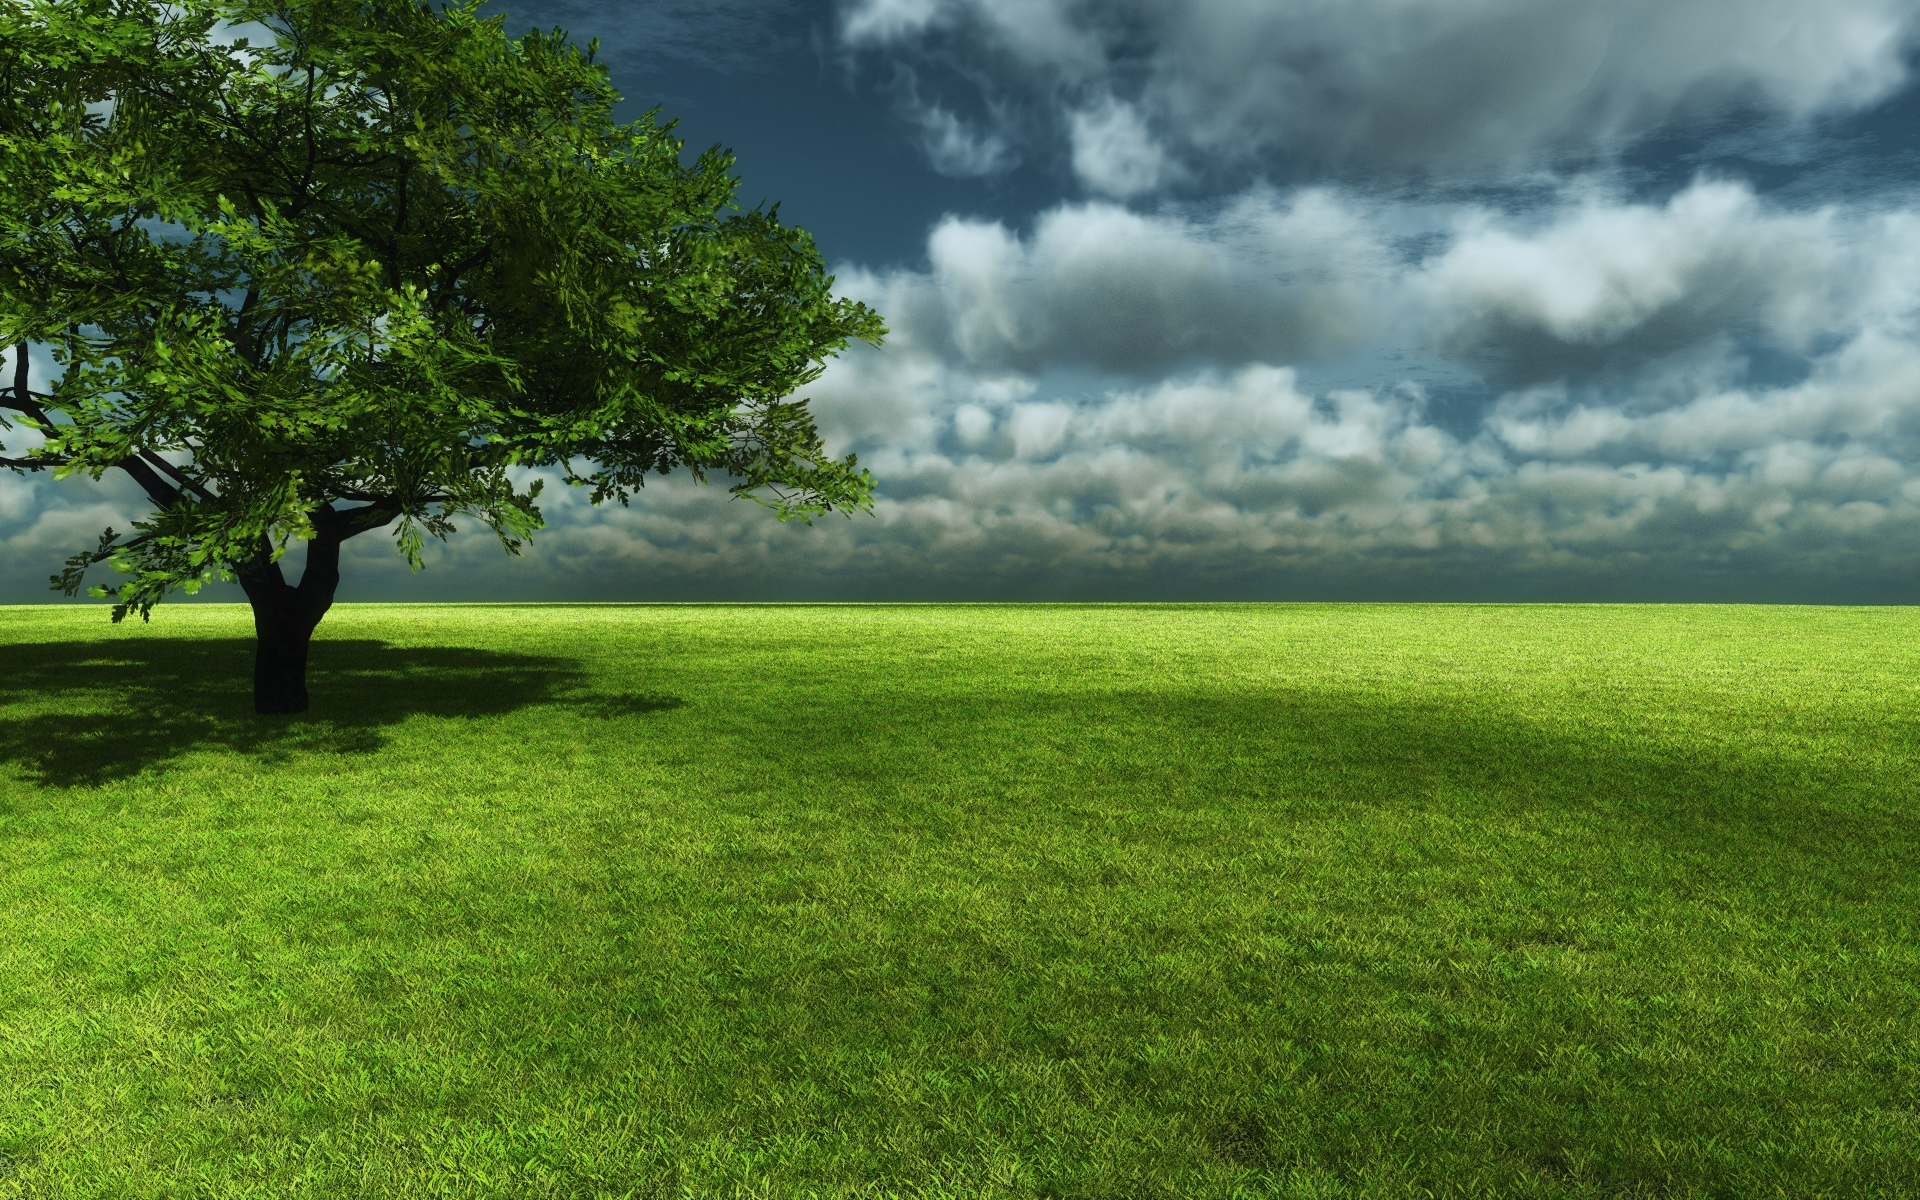 grassland2, scenery, background, photos, grassland, mountain, golden ...